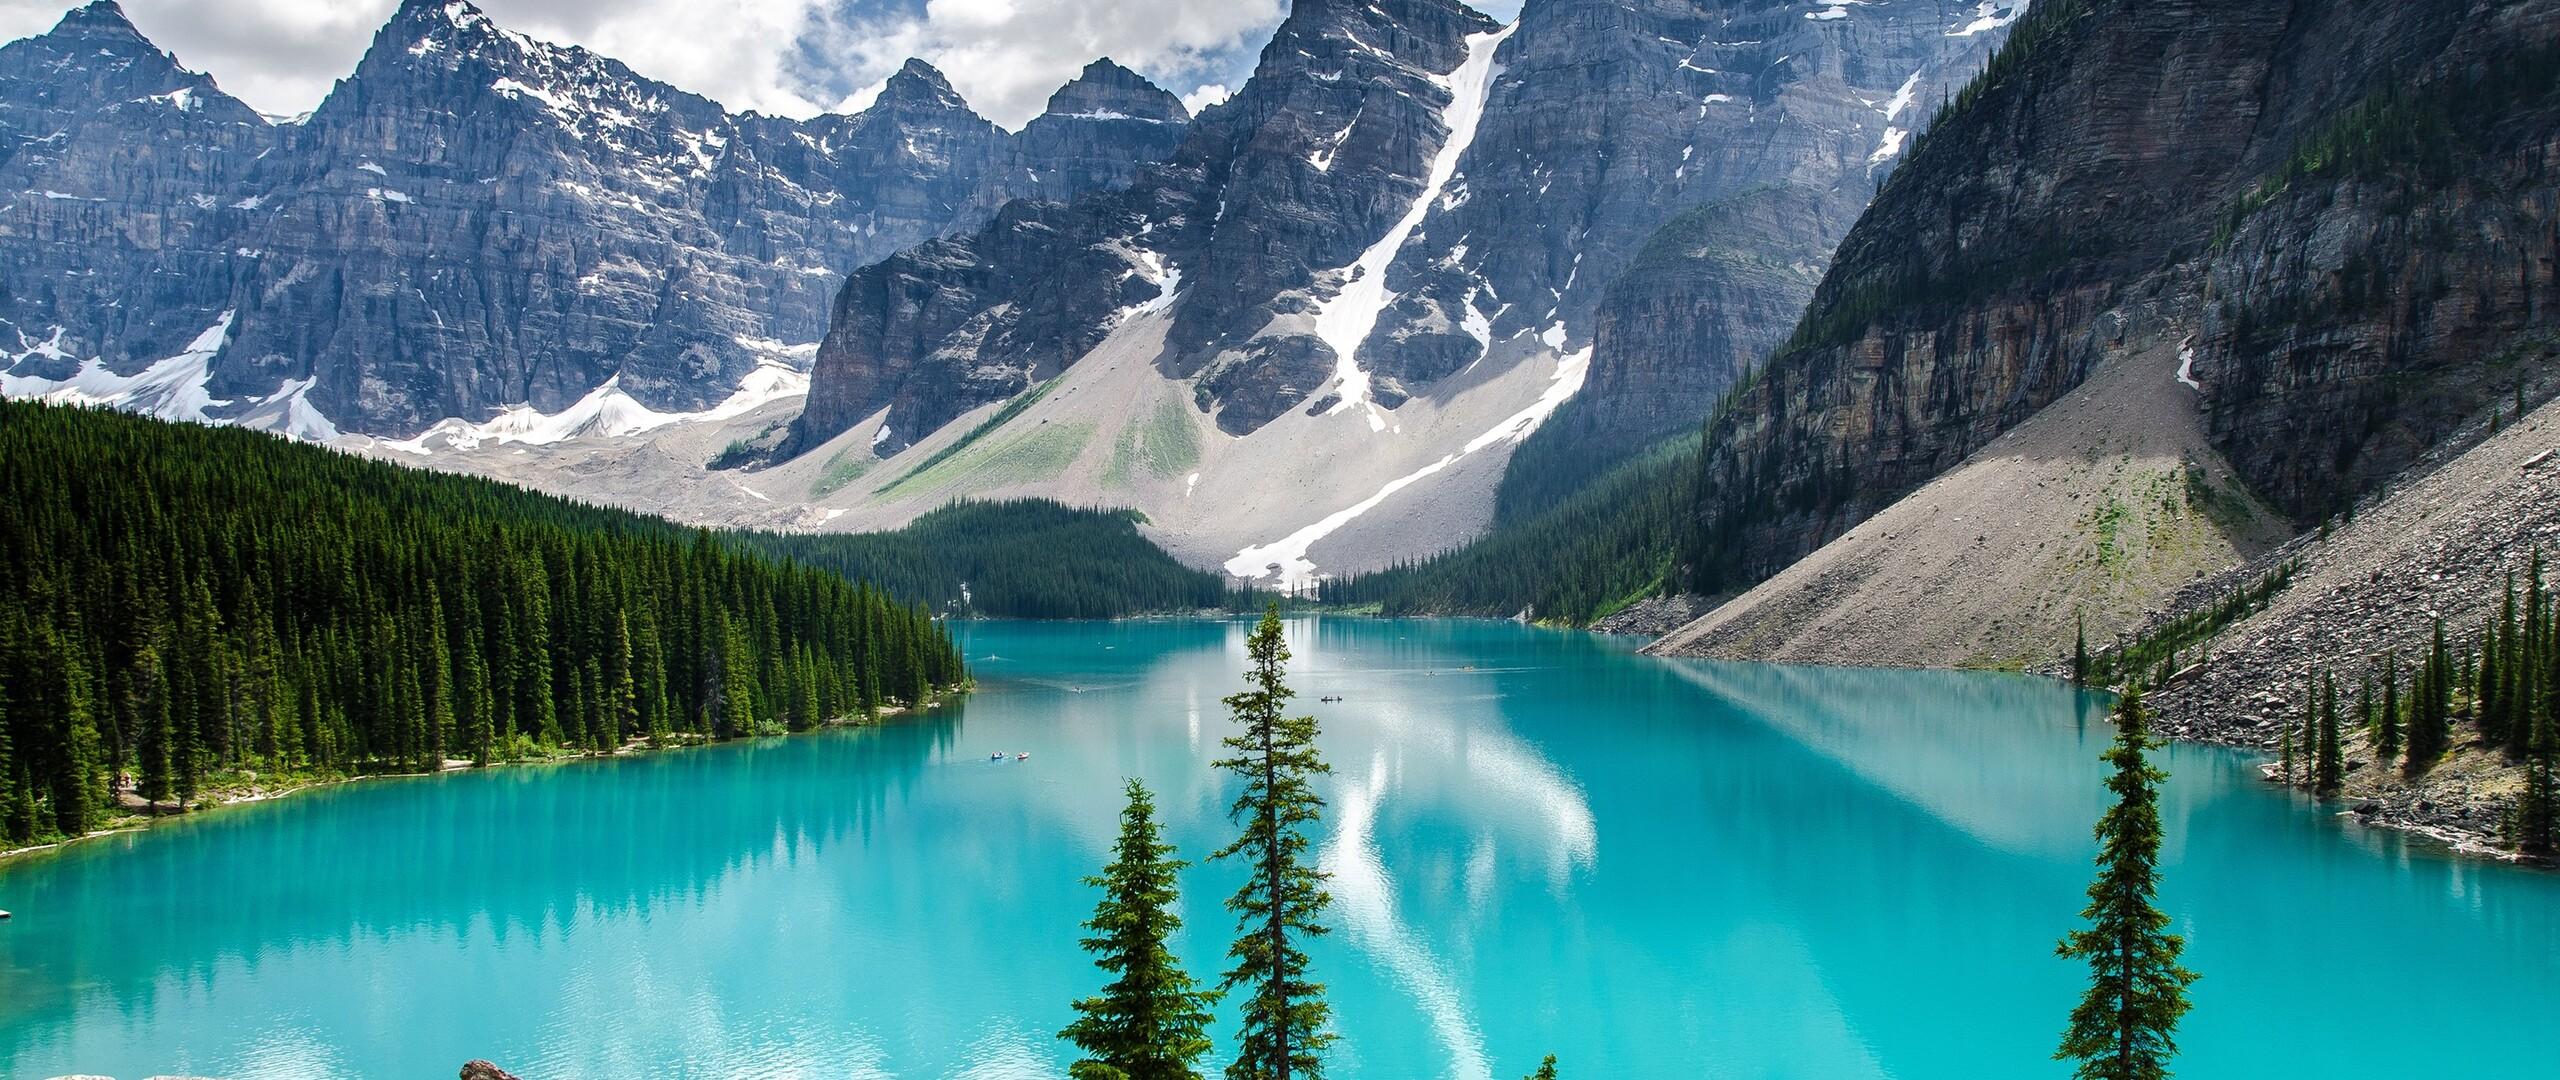 2560x1080 Moraine Lake National Park 2560x1080 Resolution Hd